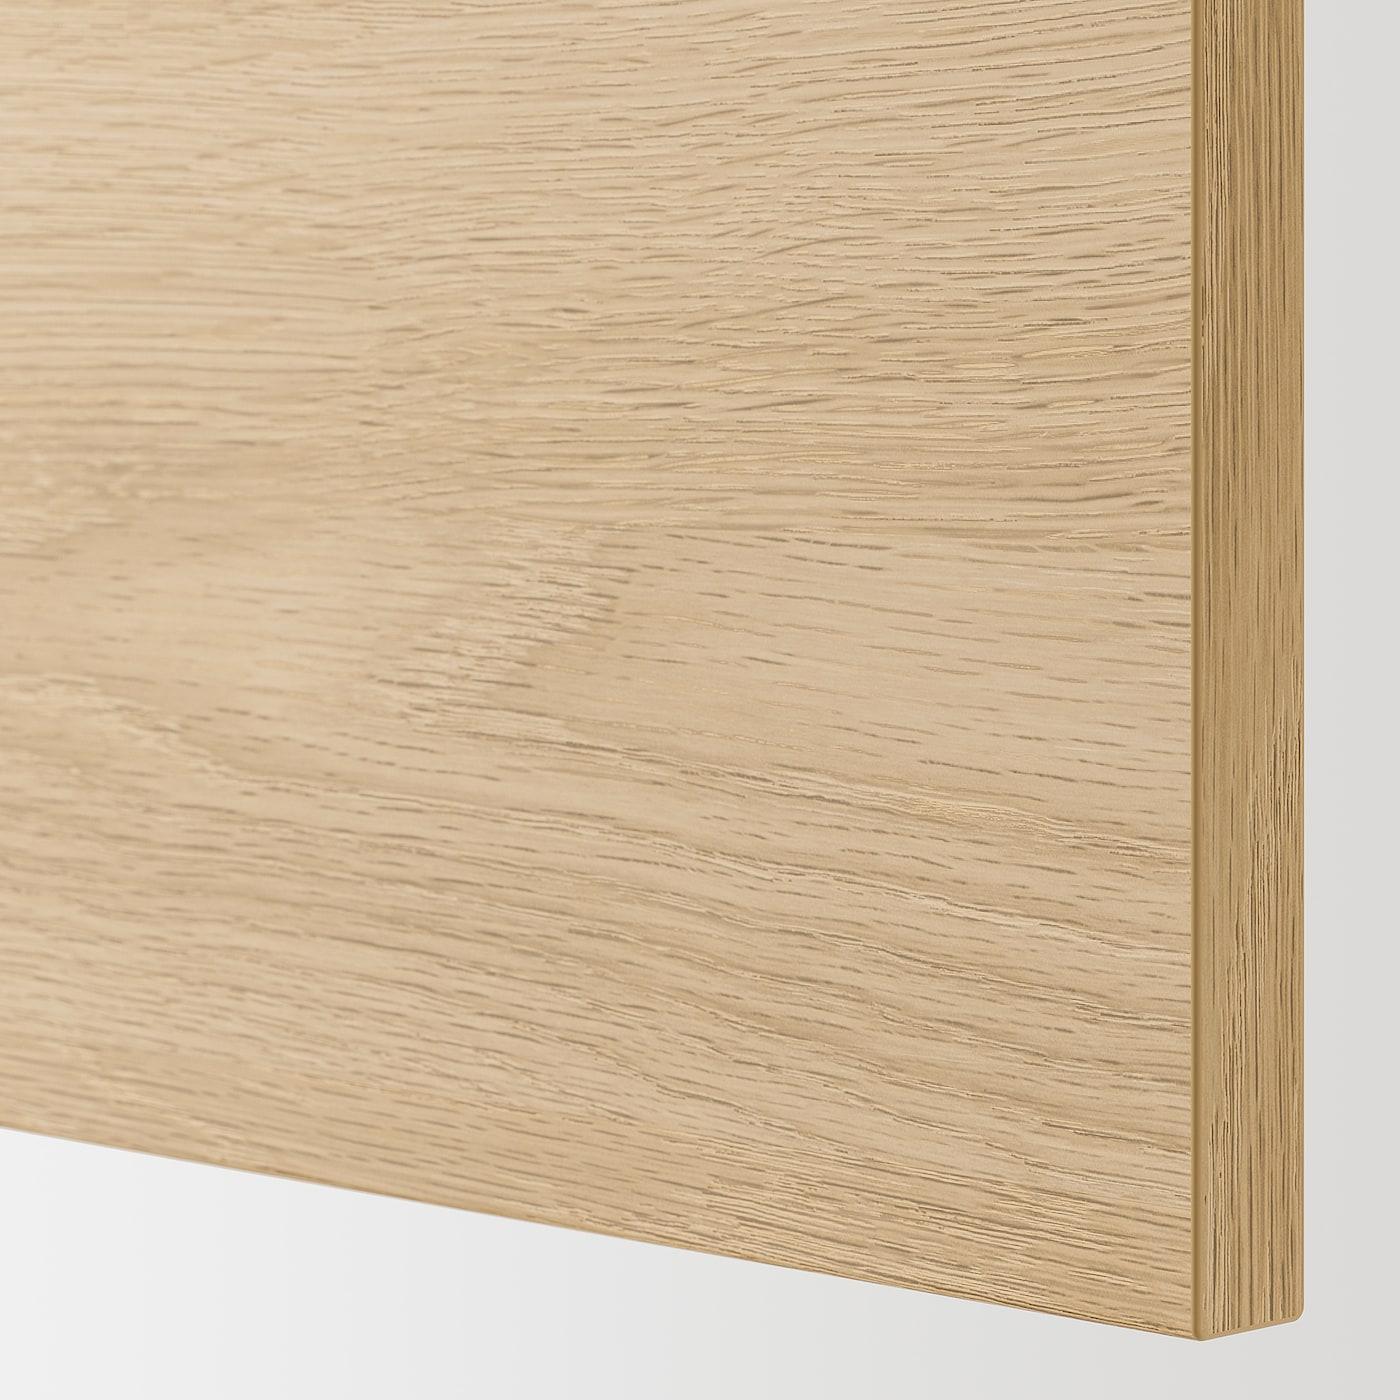 ENHET خزانة حائط مع رفين/باب, أبيض/شكل السنديان, 40x32x75 سم